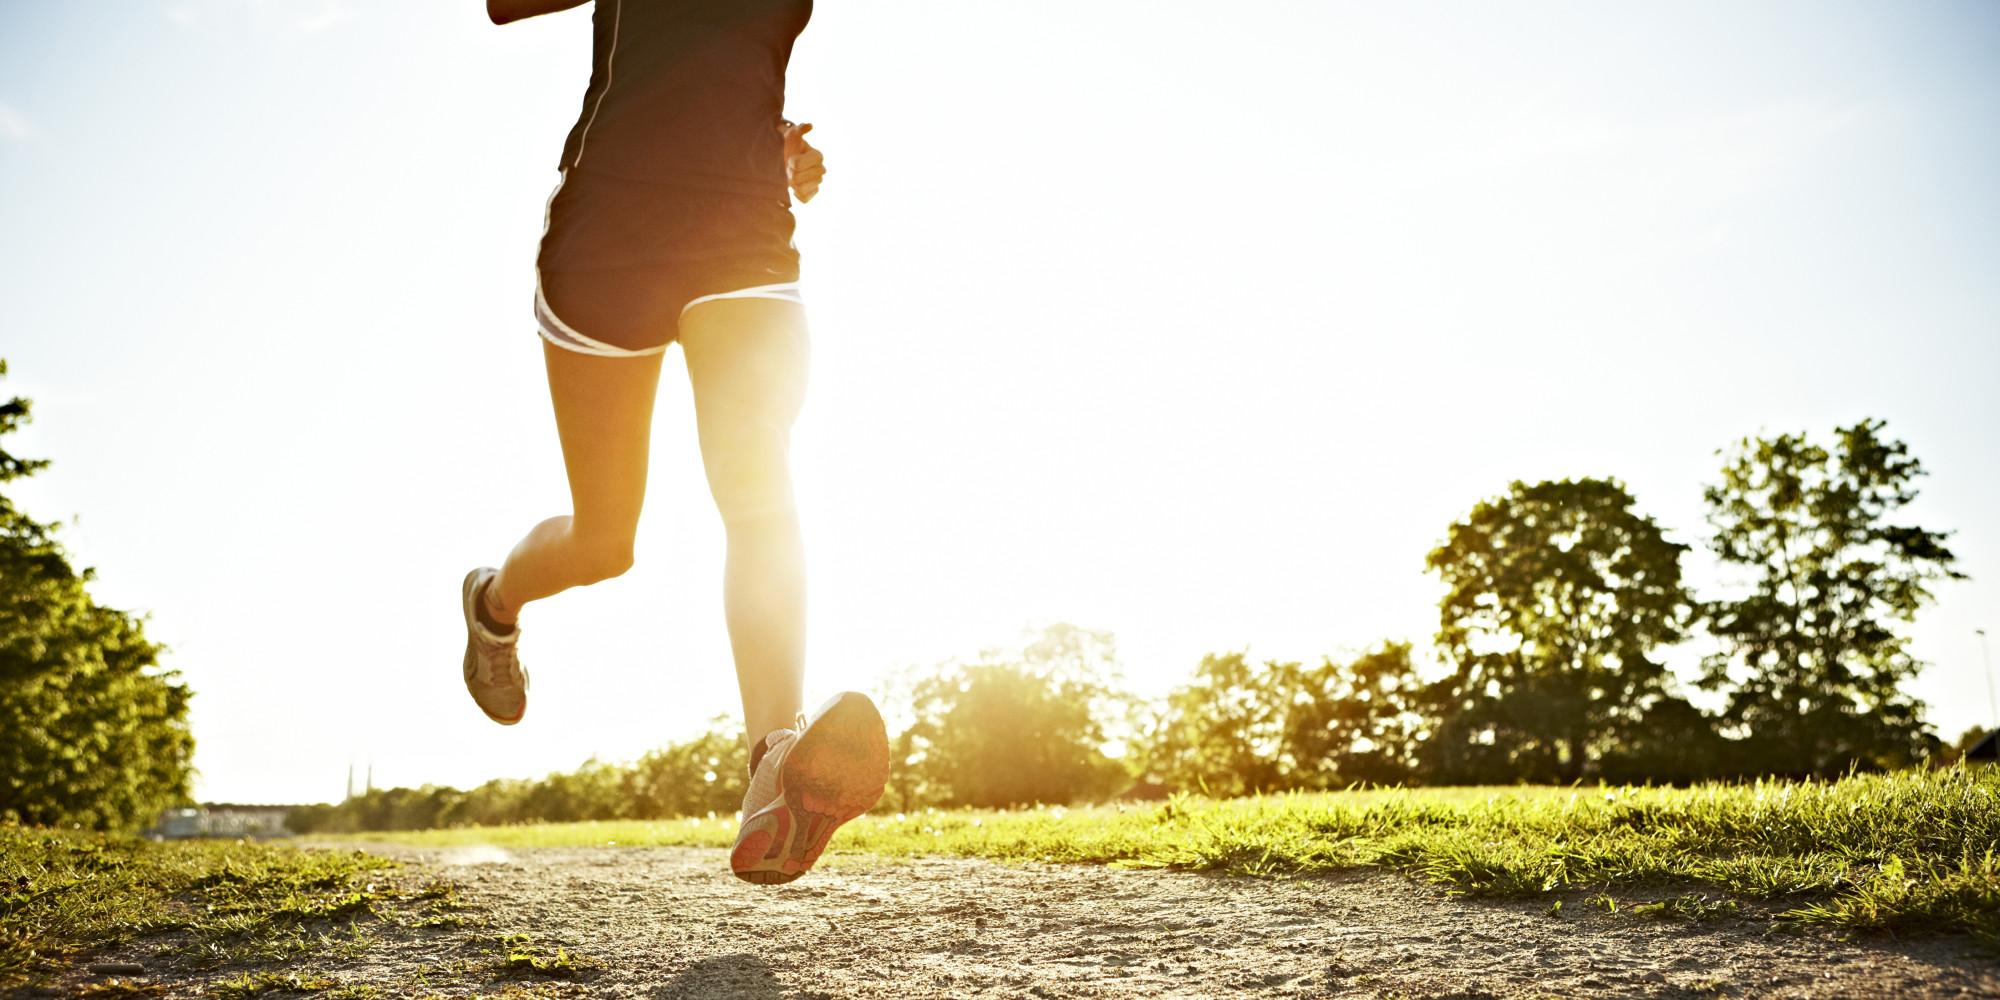 best running books runner should read